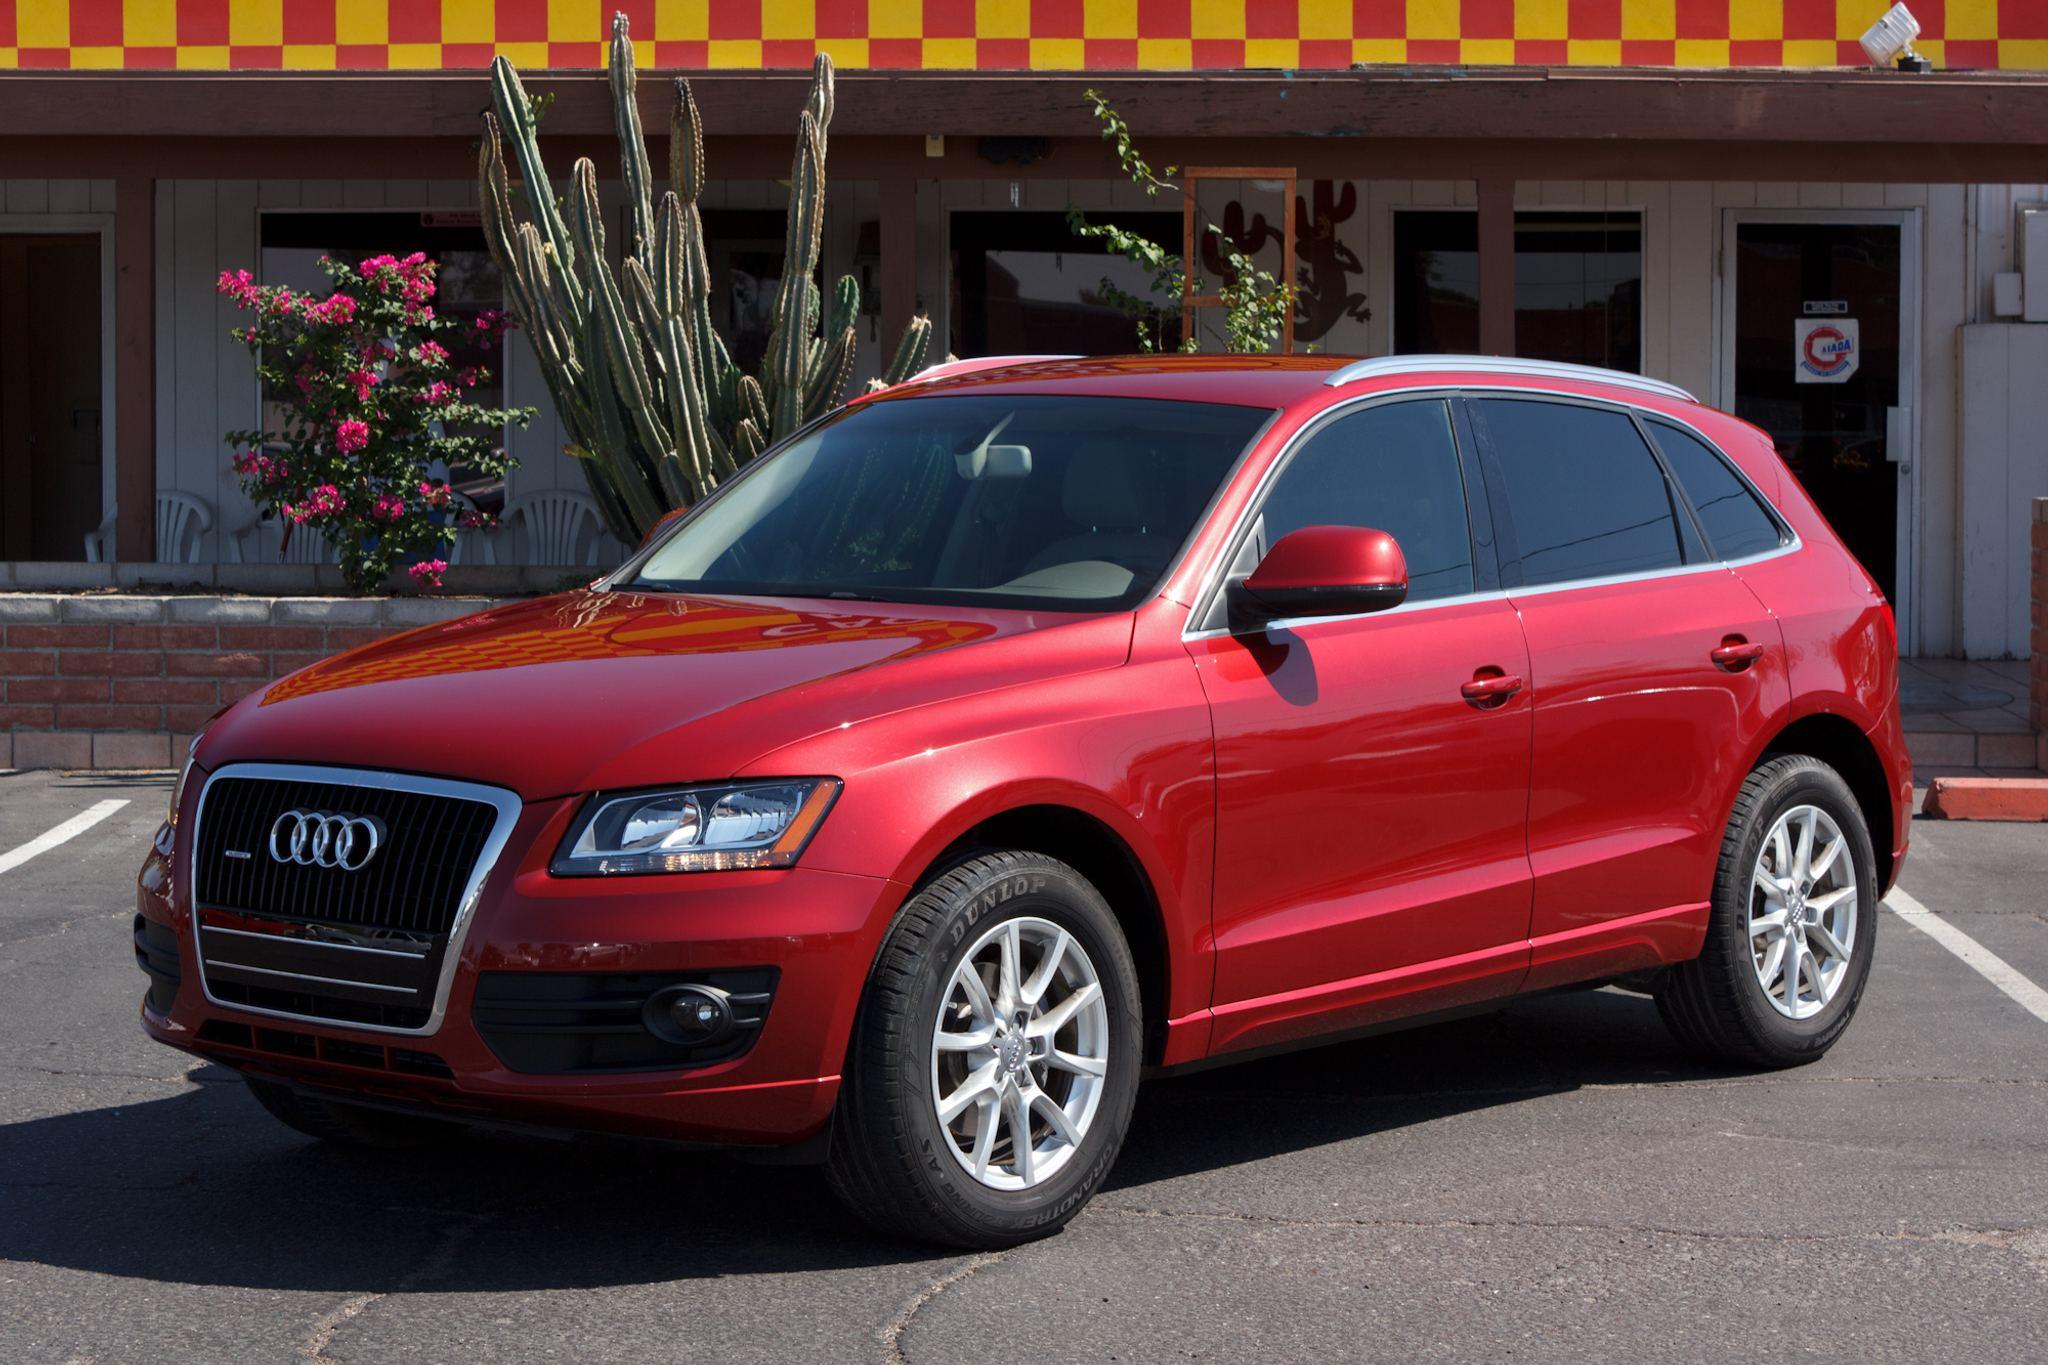 Photo of 2009 Audi Q5 4d Wagon 3.2L Premium Red